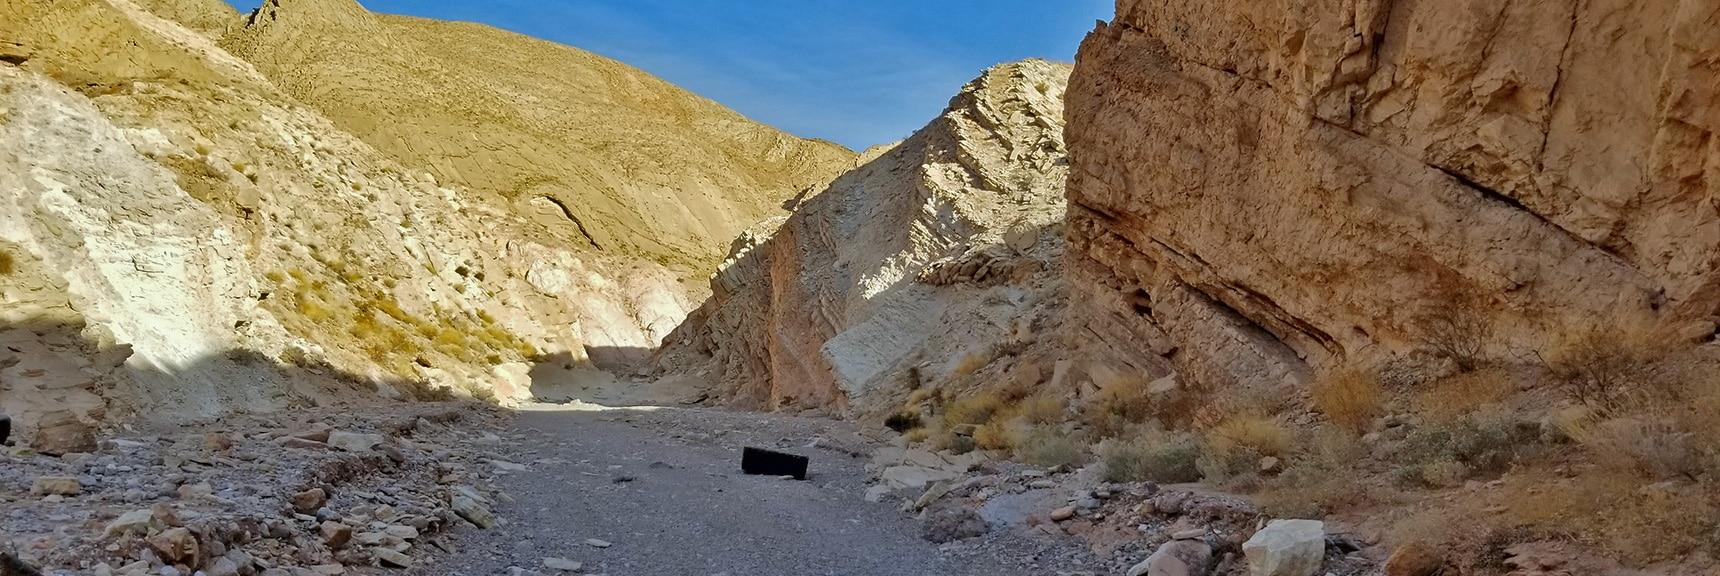 Heading Up Anniversary Narrows Wash   Anniversary Narrows   Muddy Mountains Wilderness, Nevada